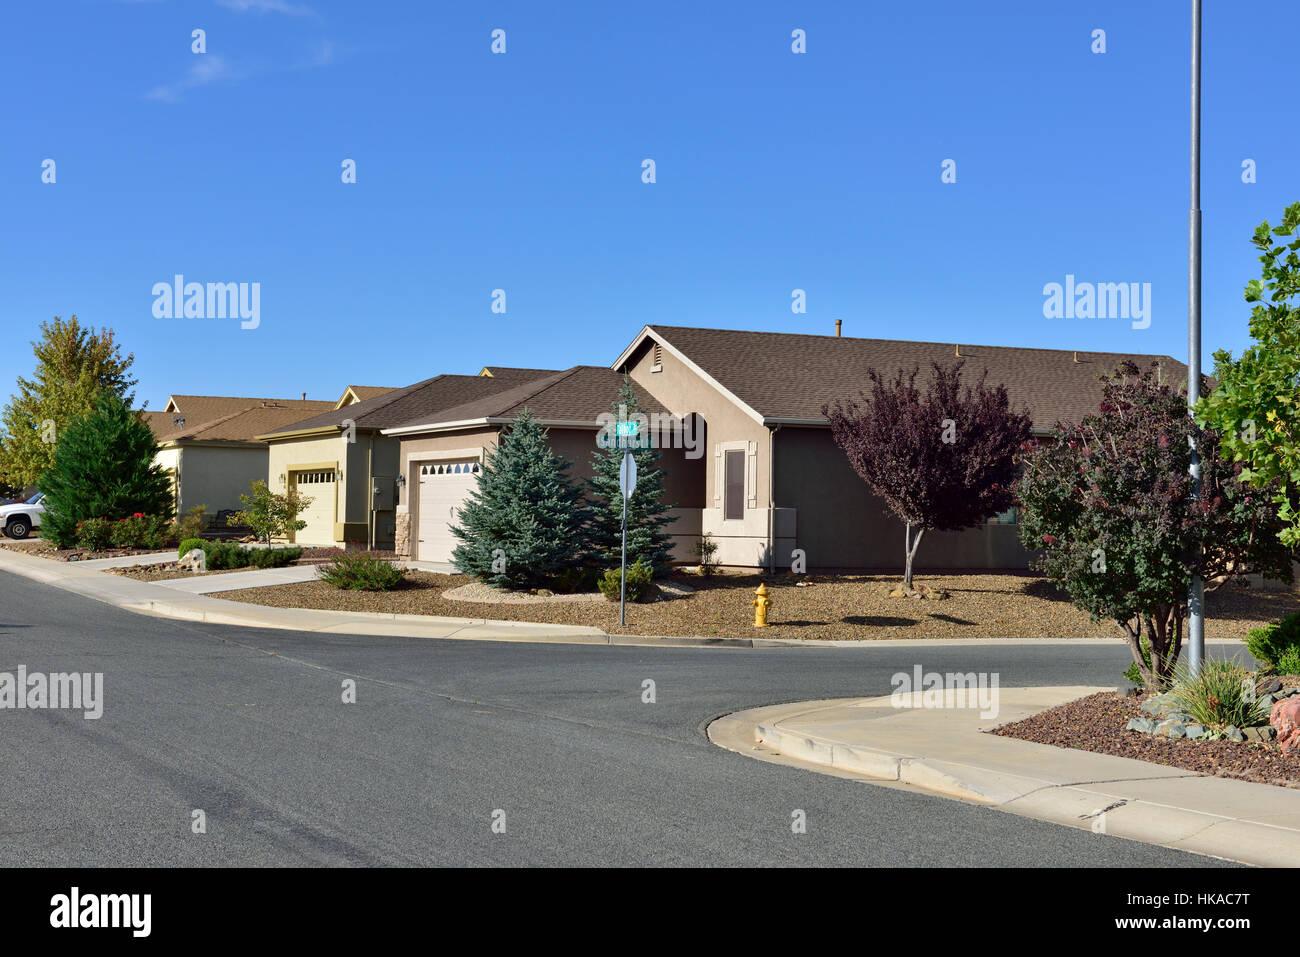 Maison jardin aménagement paysager en climat sec de Yavapai county, Arizona, USA Photo Stock